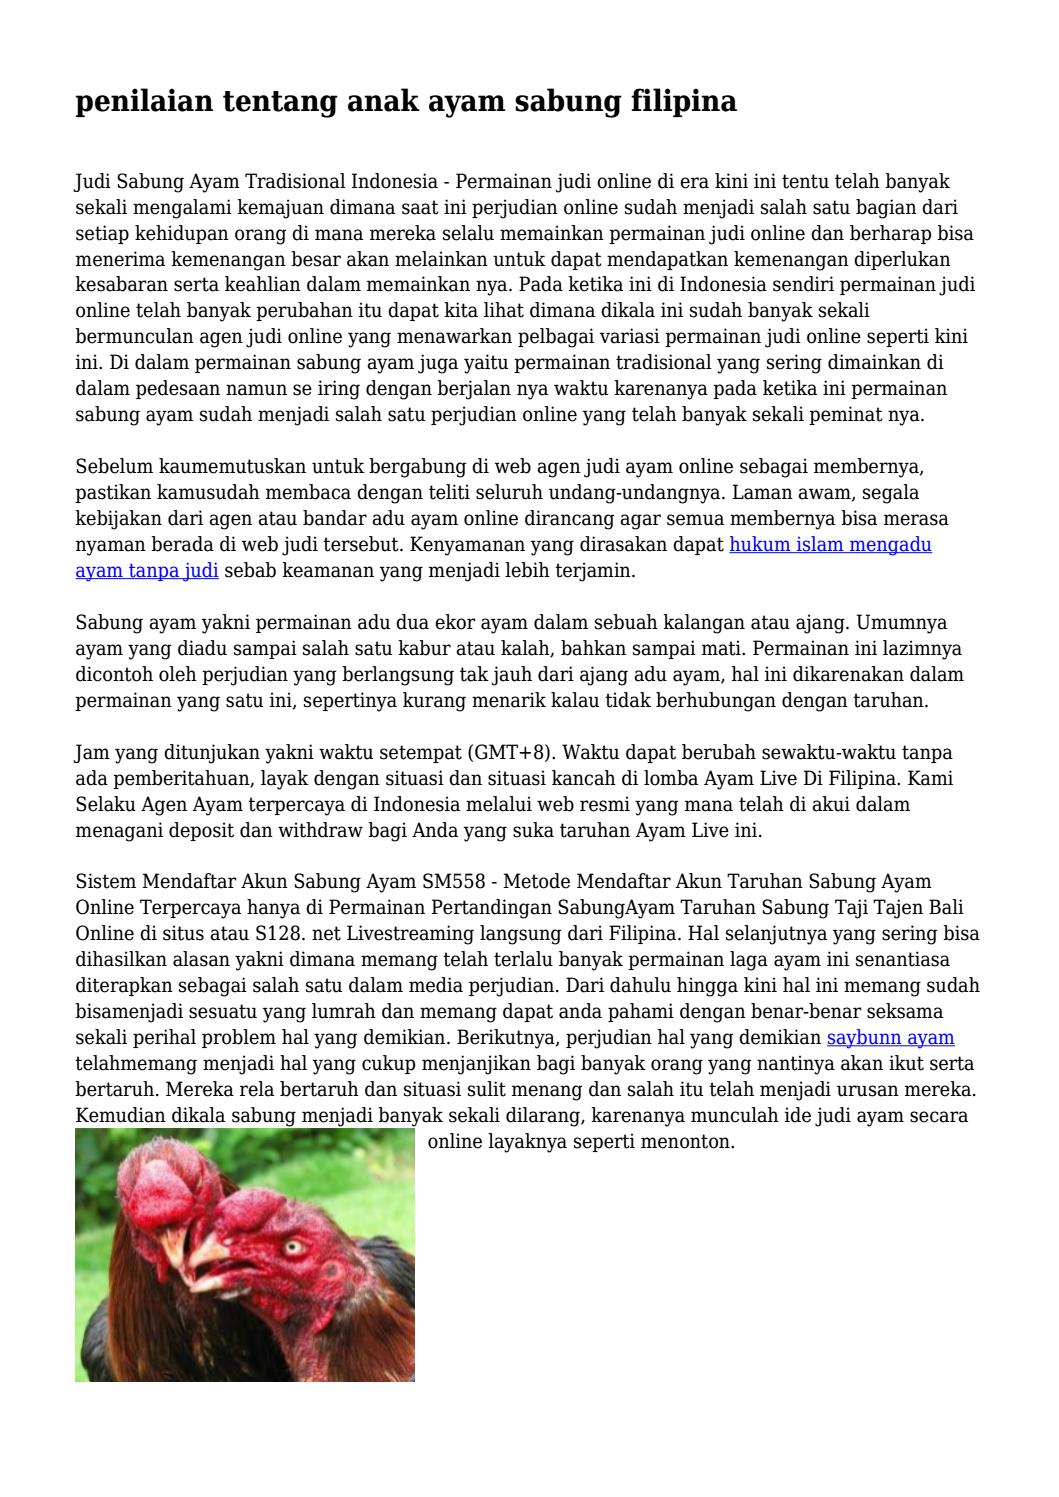 Penilaian Tentang Anak Ayam Sabung Filipina By Carl6sargent7 Issuu